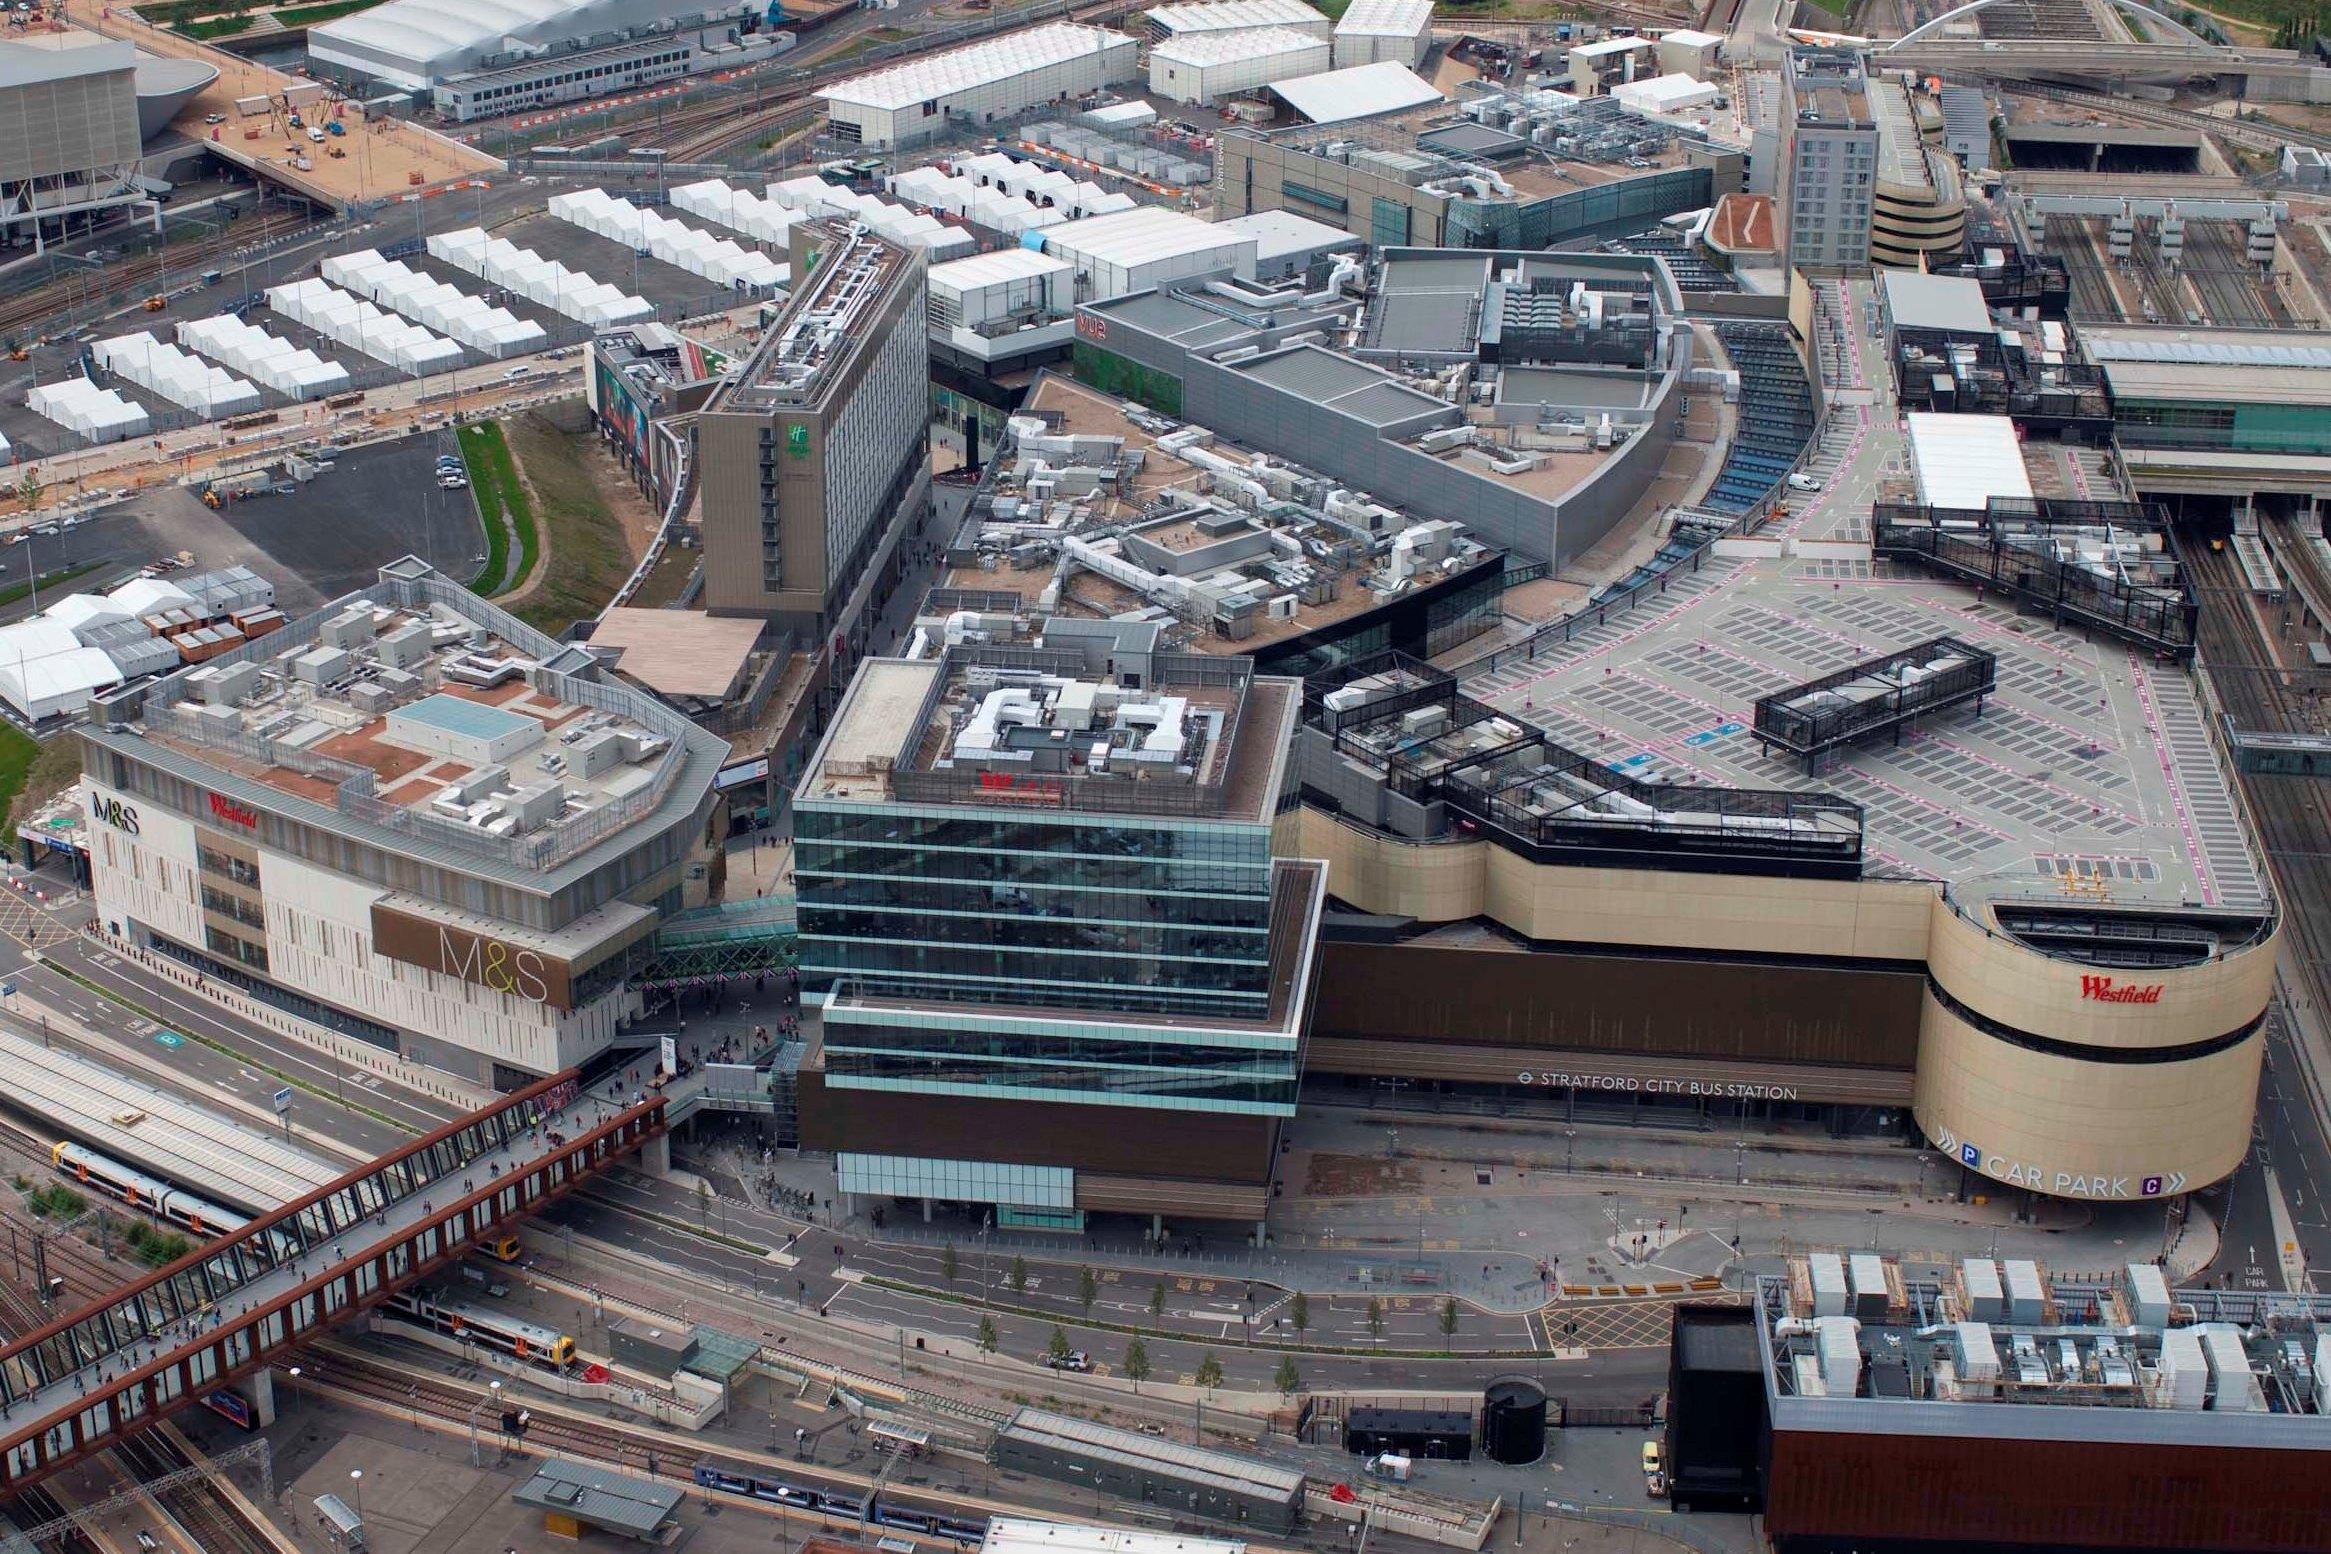 Westfield Shopping Centre - Stratford, London